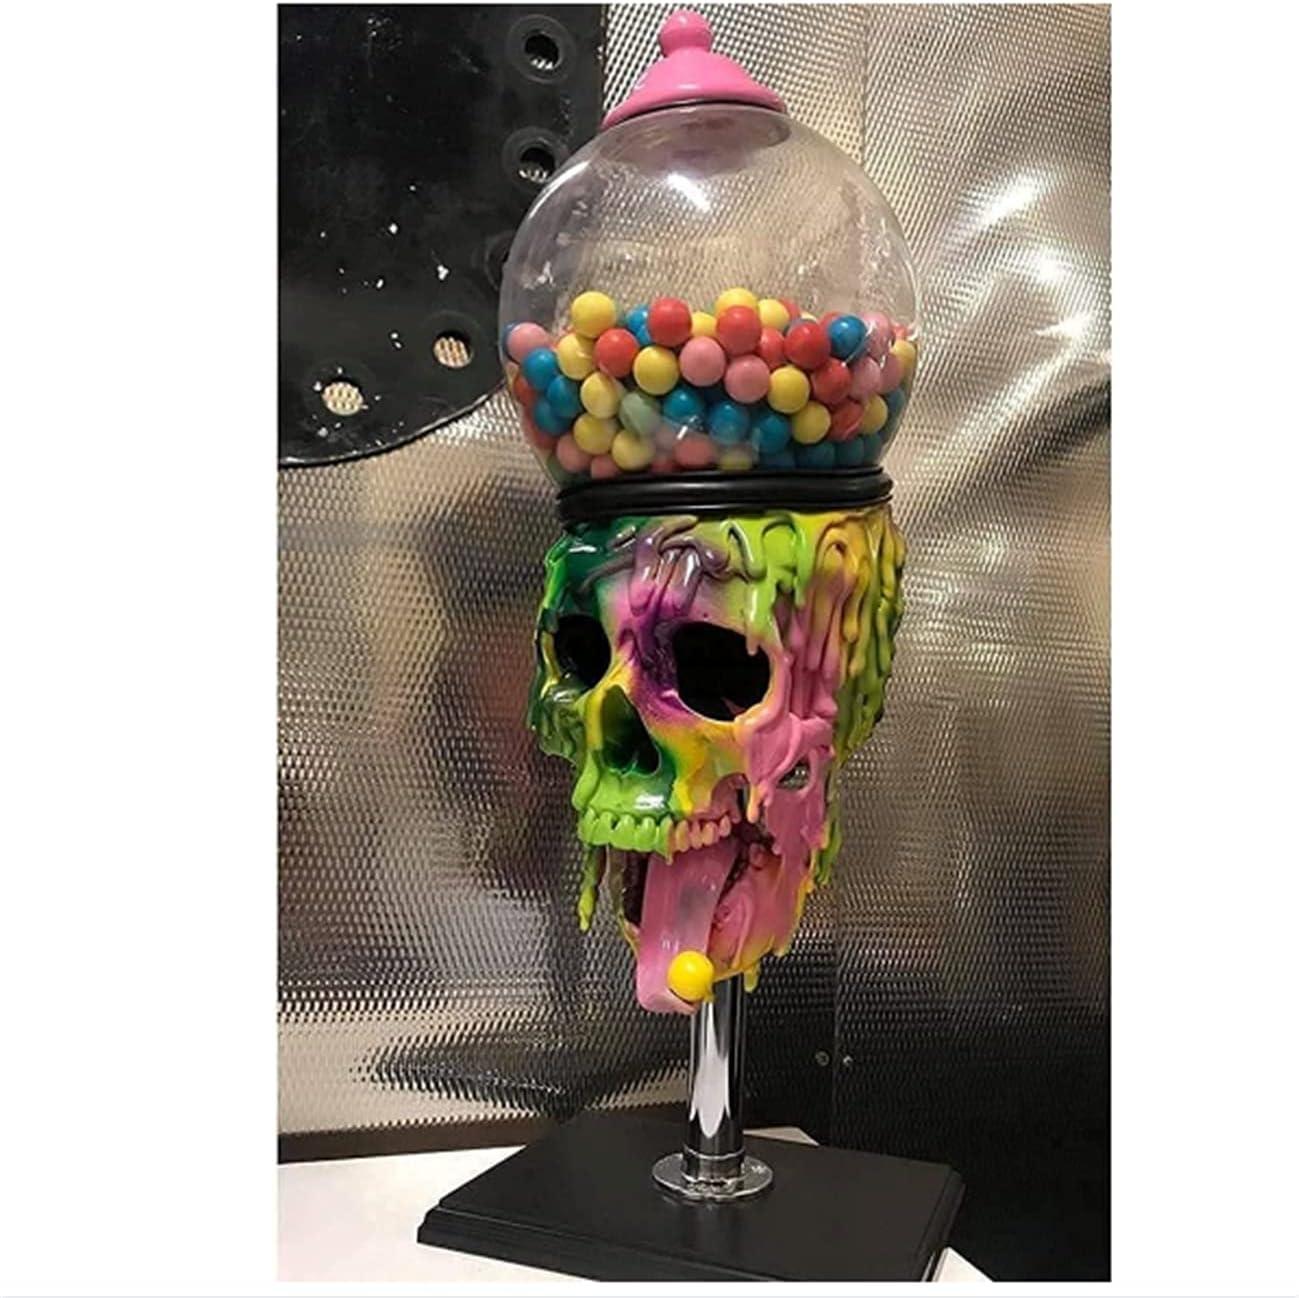 NHY Decoraciones del cráneo de Halloween, Escultura de Halloween, Máquina de chicles de Burbujas, Dispensador de Caramelo de Skull, Dispensador de máquinas expendedoras de Gumball,